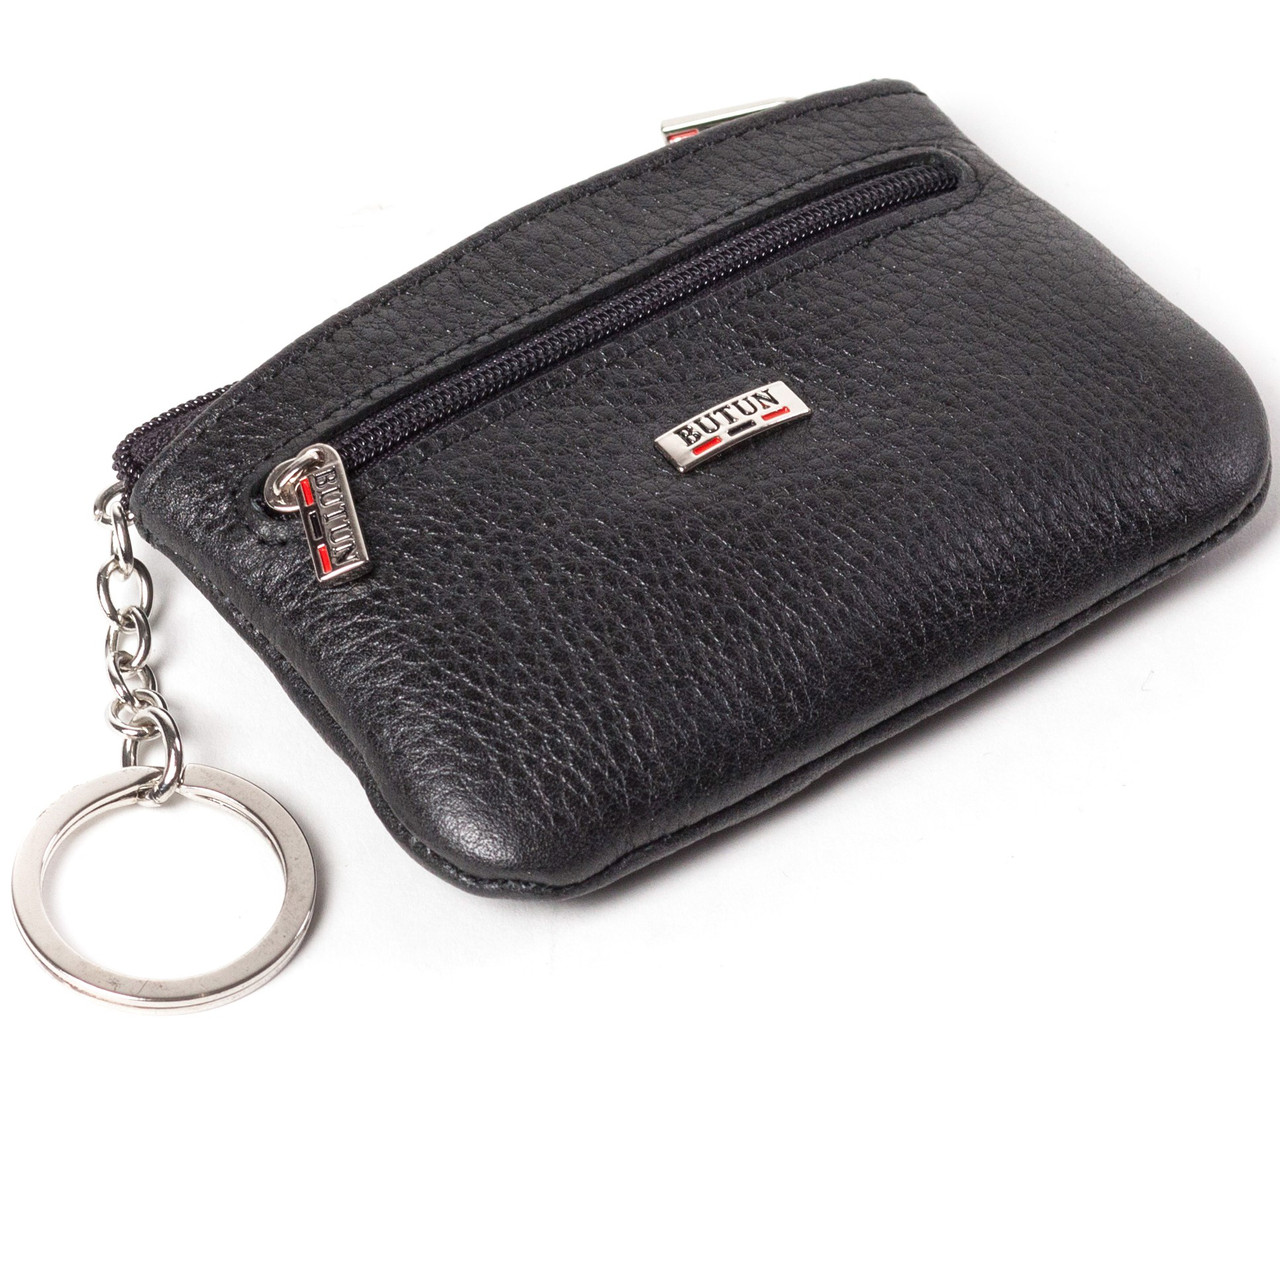 Ключница кожаная черная Butun 761-004-001